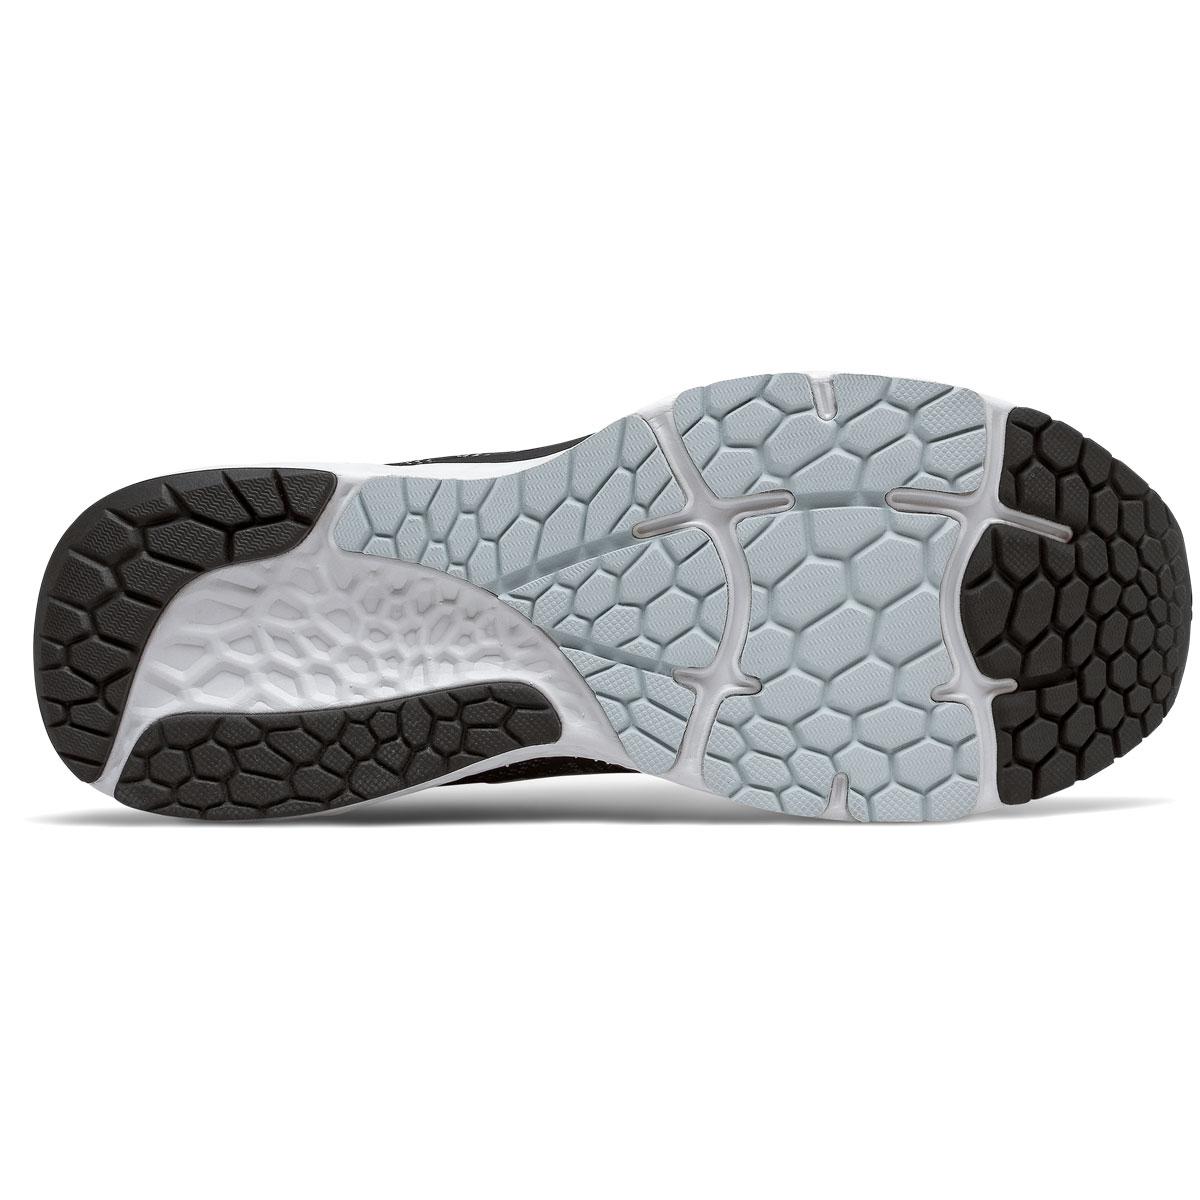 Men's New Balance Fresh Foam 880v11 Running Shoe - Color: Black/Cyclone - Size: 6 - Width: Wide, Black/Cyclone, large, image 4